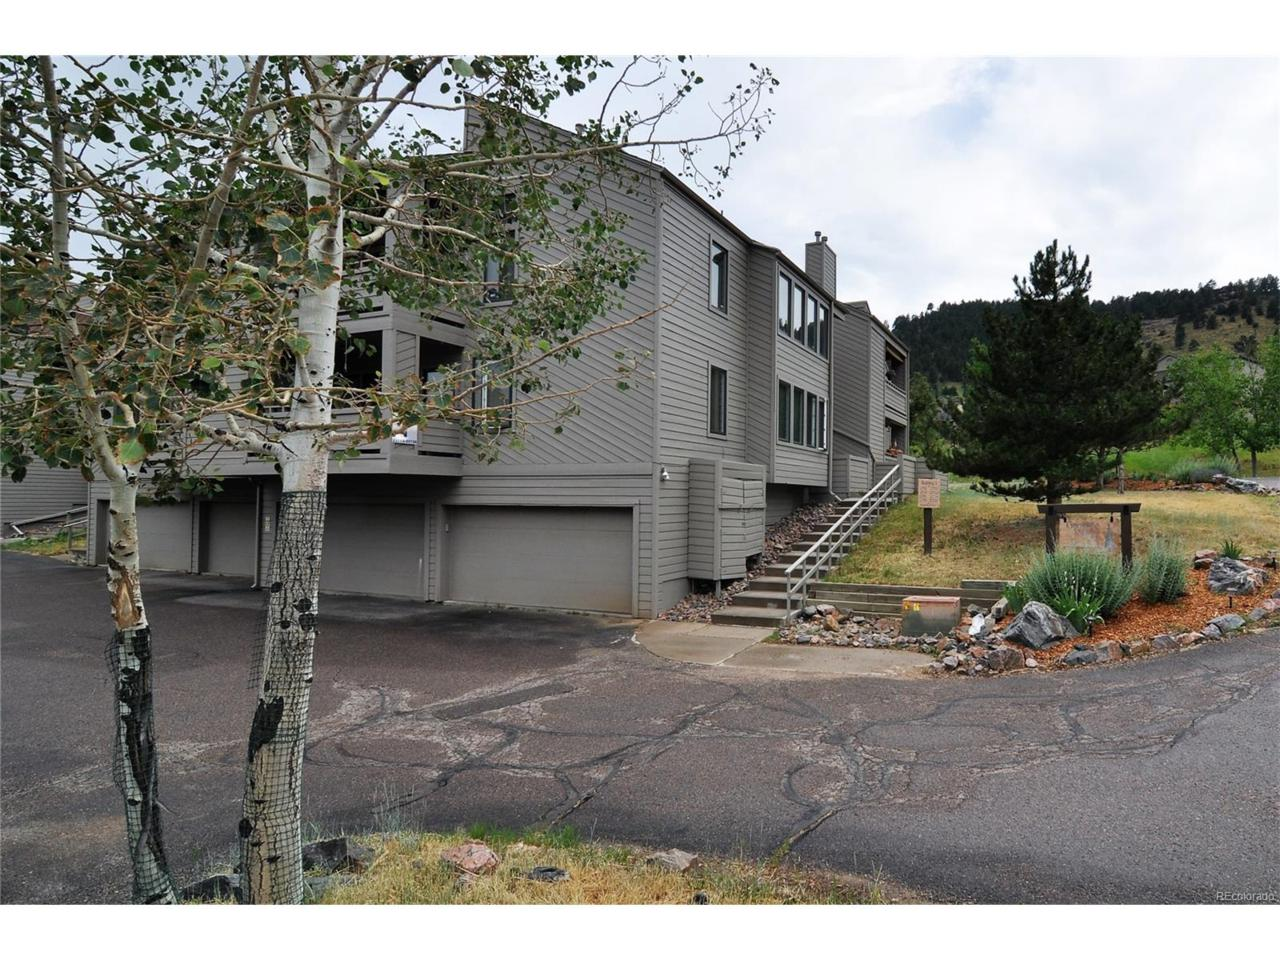 23724 Pondview Place G, Golden, CO 80401 (MLS #2678739) :: 8z Real Estate